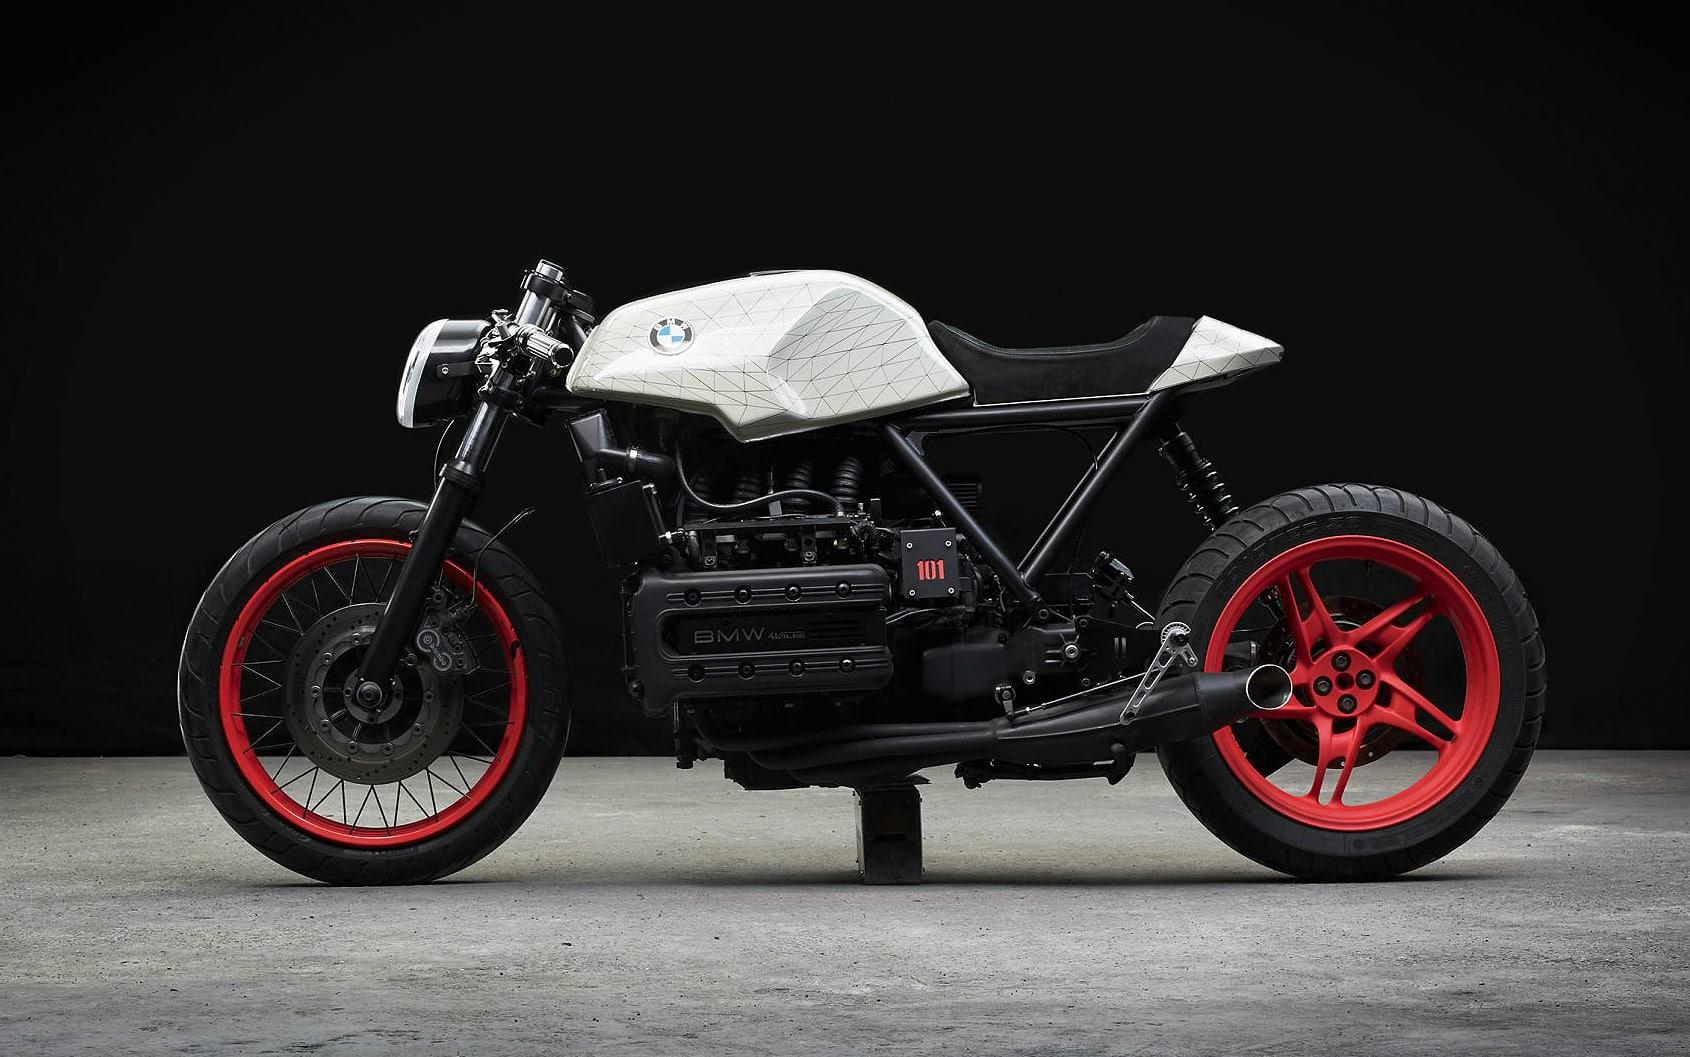 BMW K100 ImpulsI K101 Motorcycle